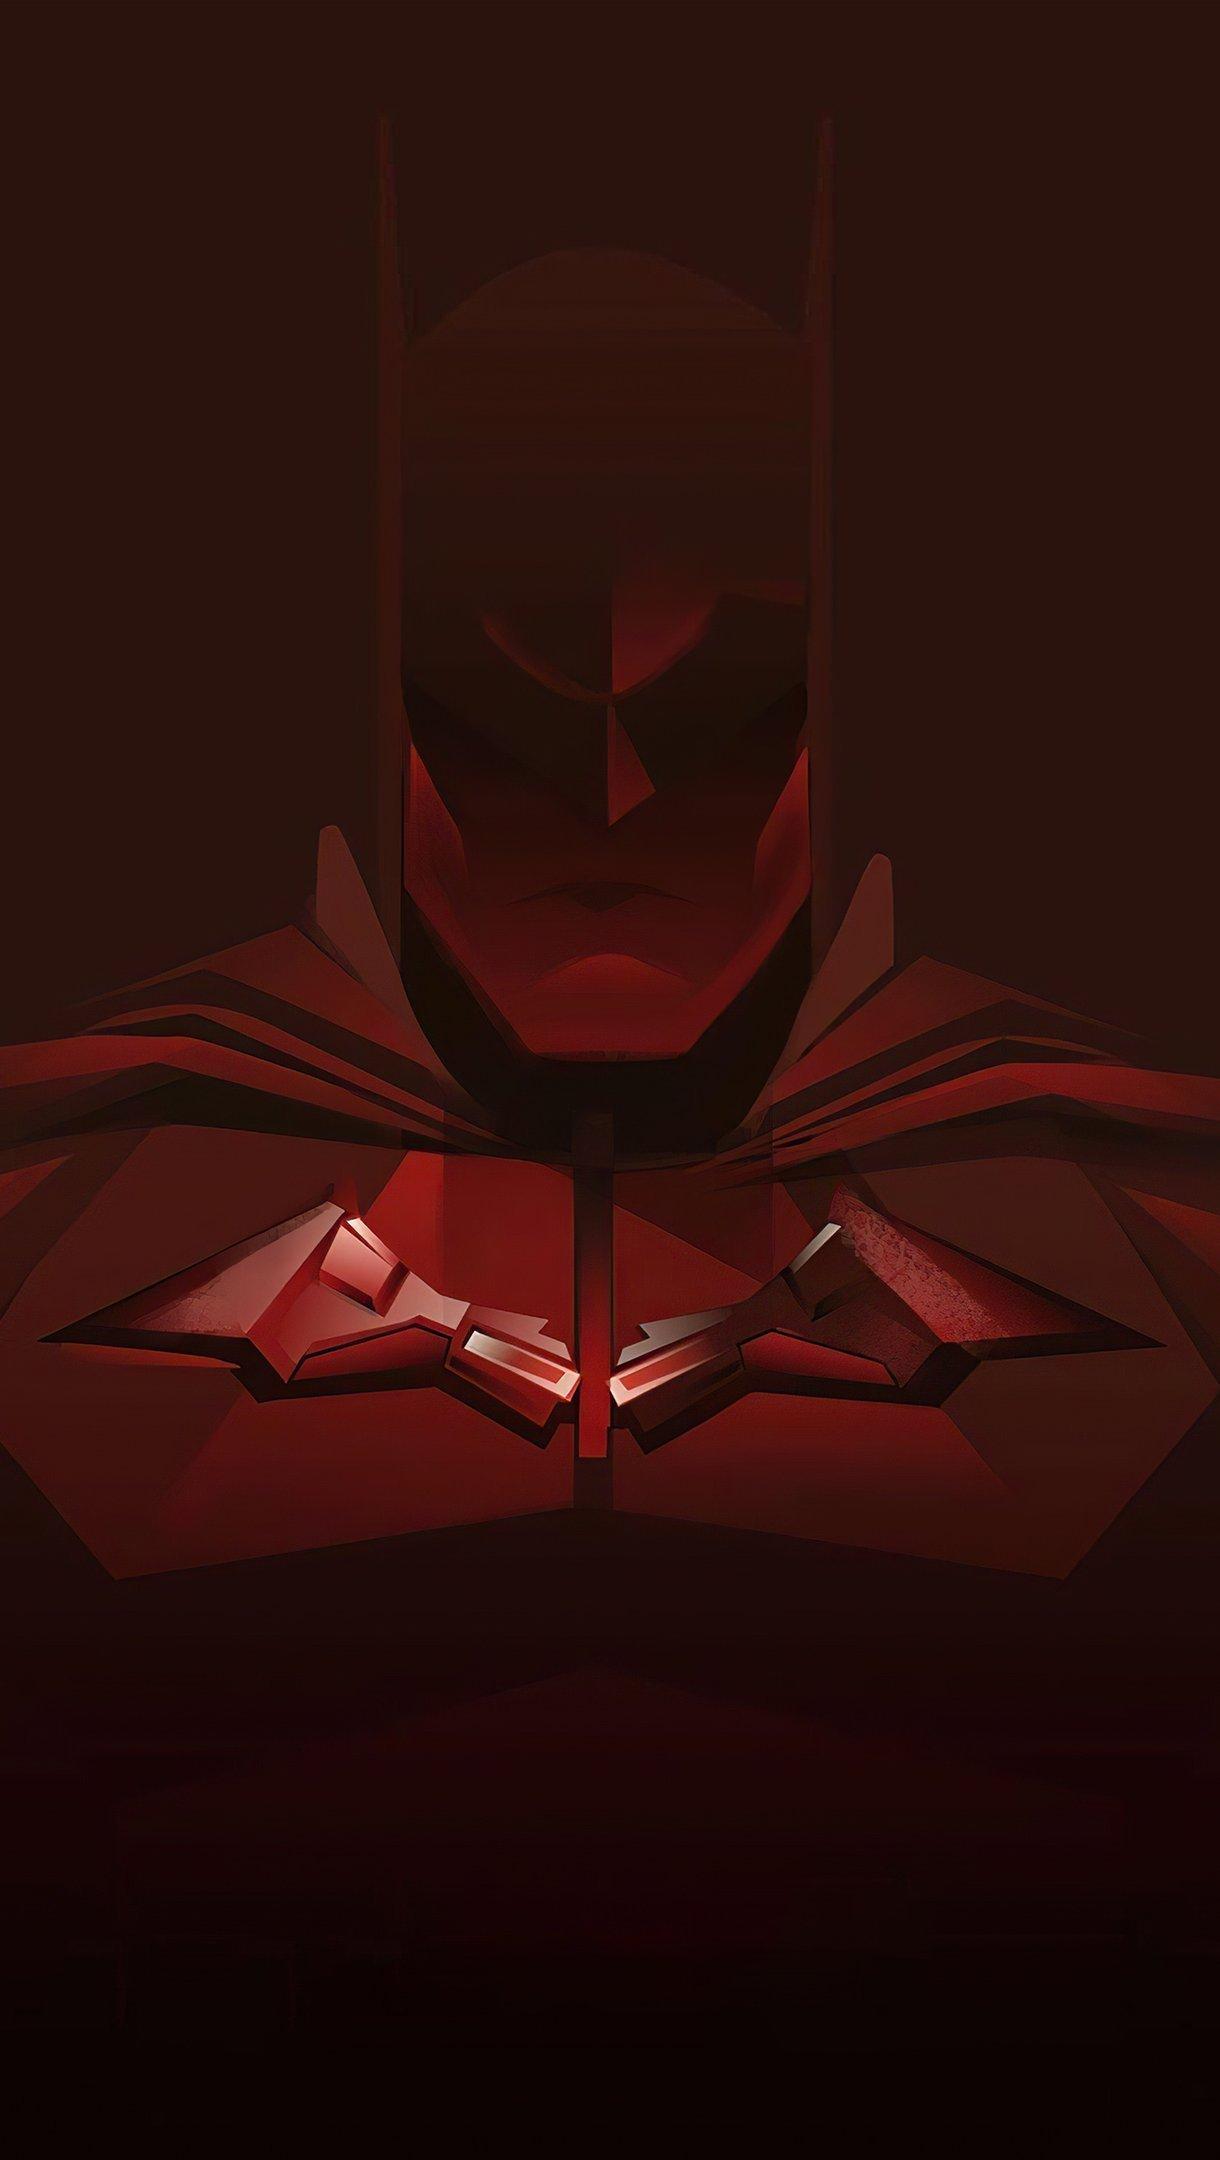 Wallpaper Red Batman Minimal Vertical